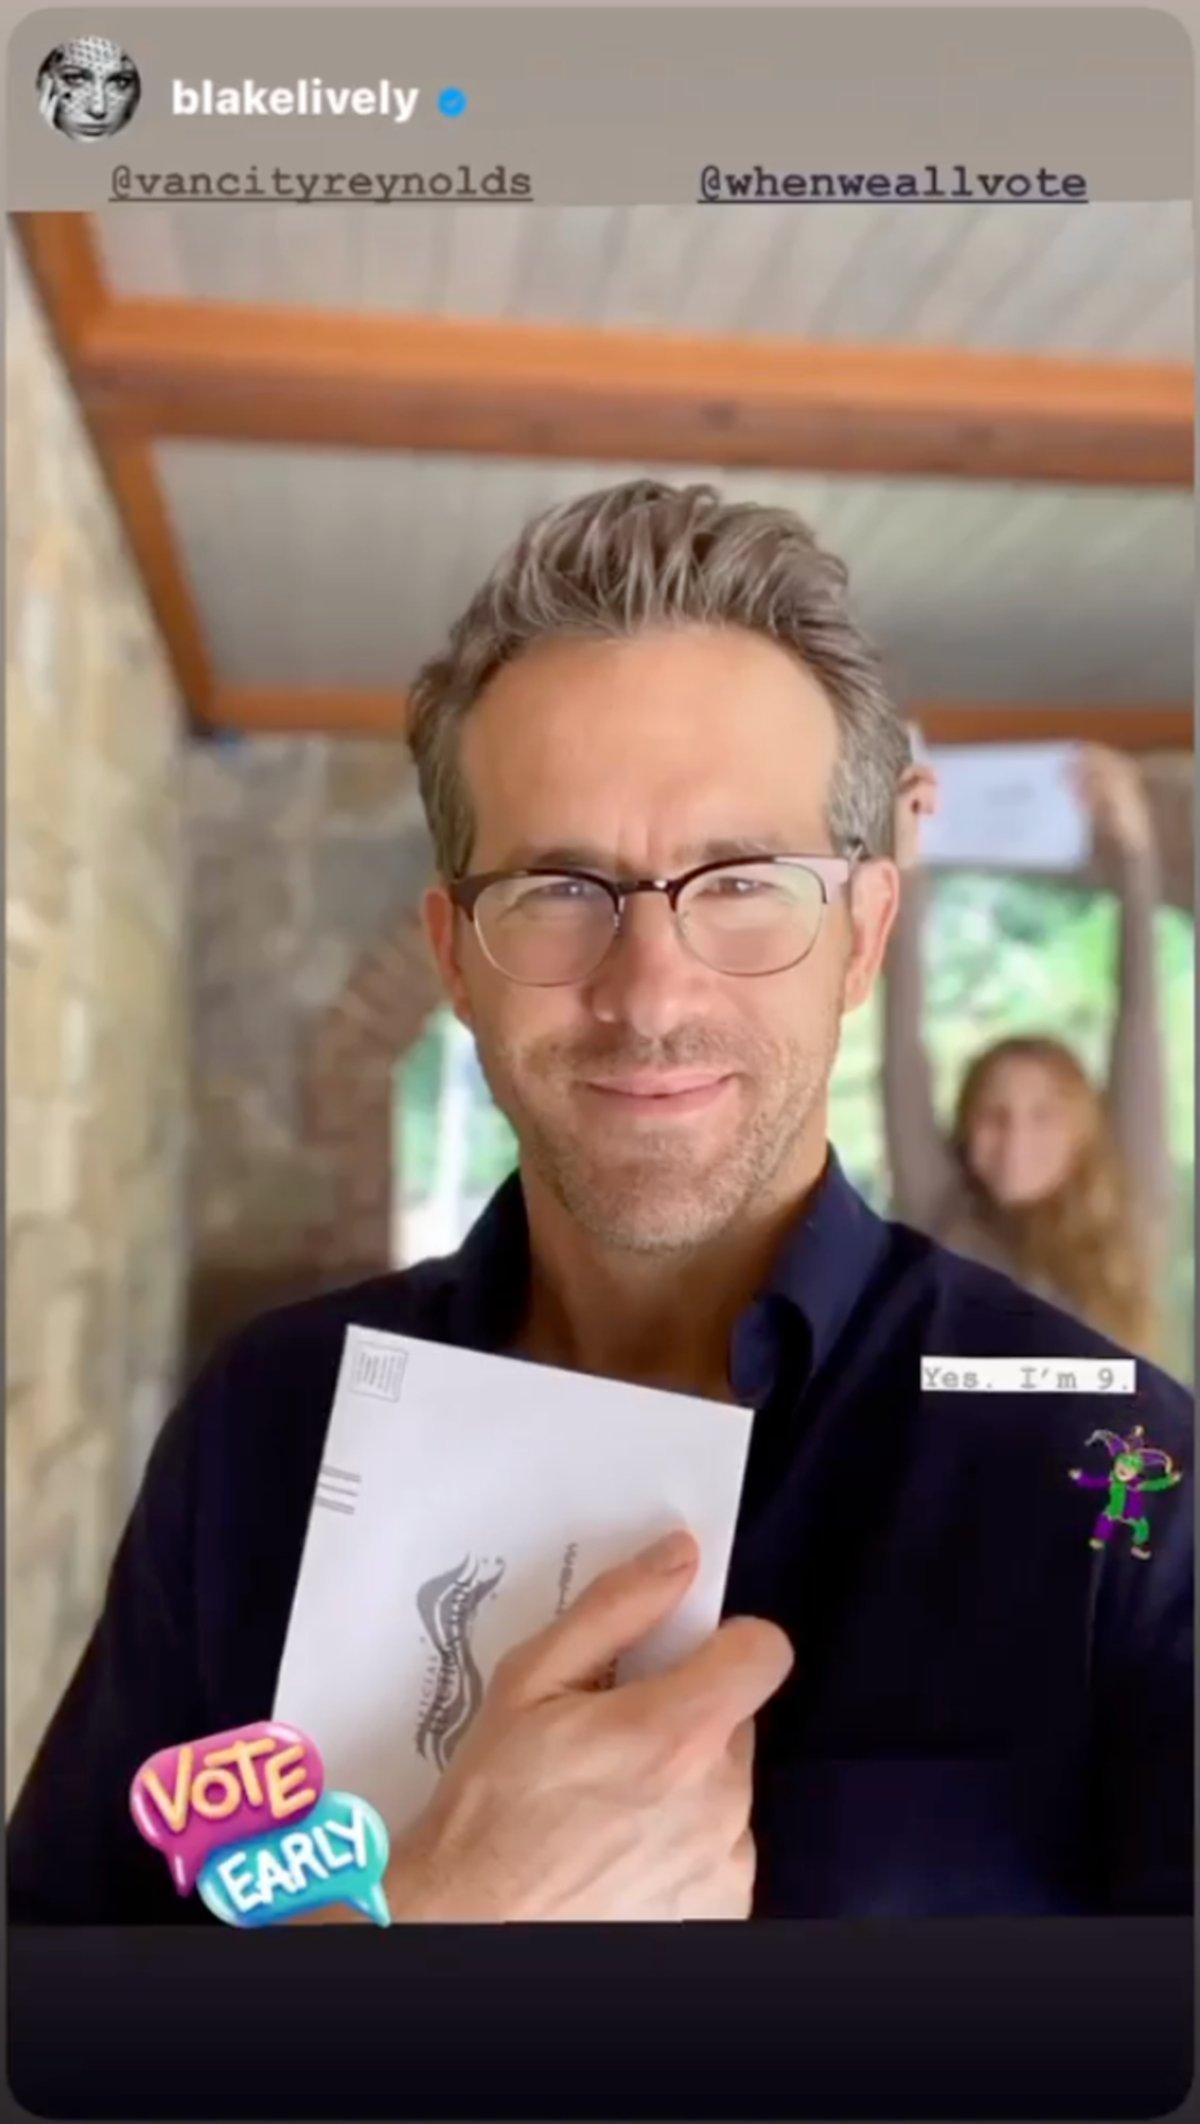 Ryan Reynolds holding his ballot proudly